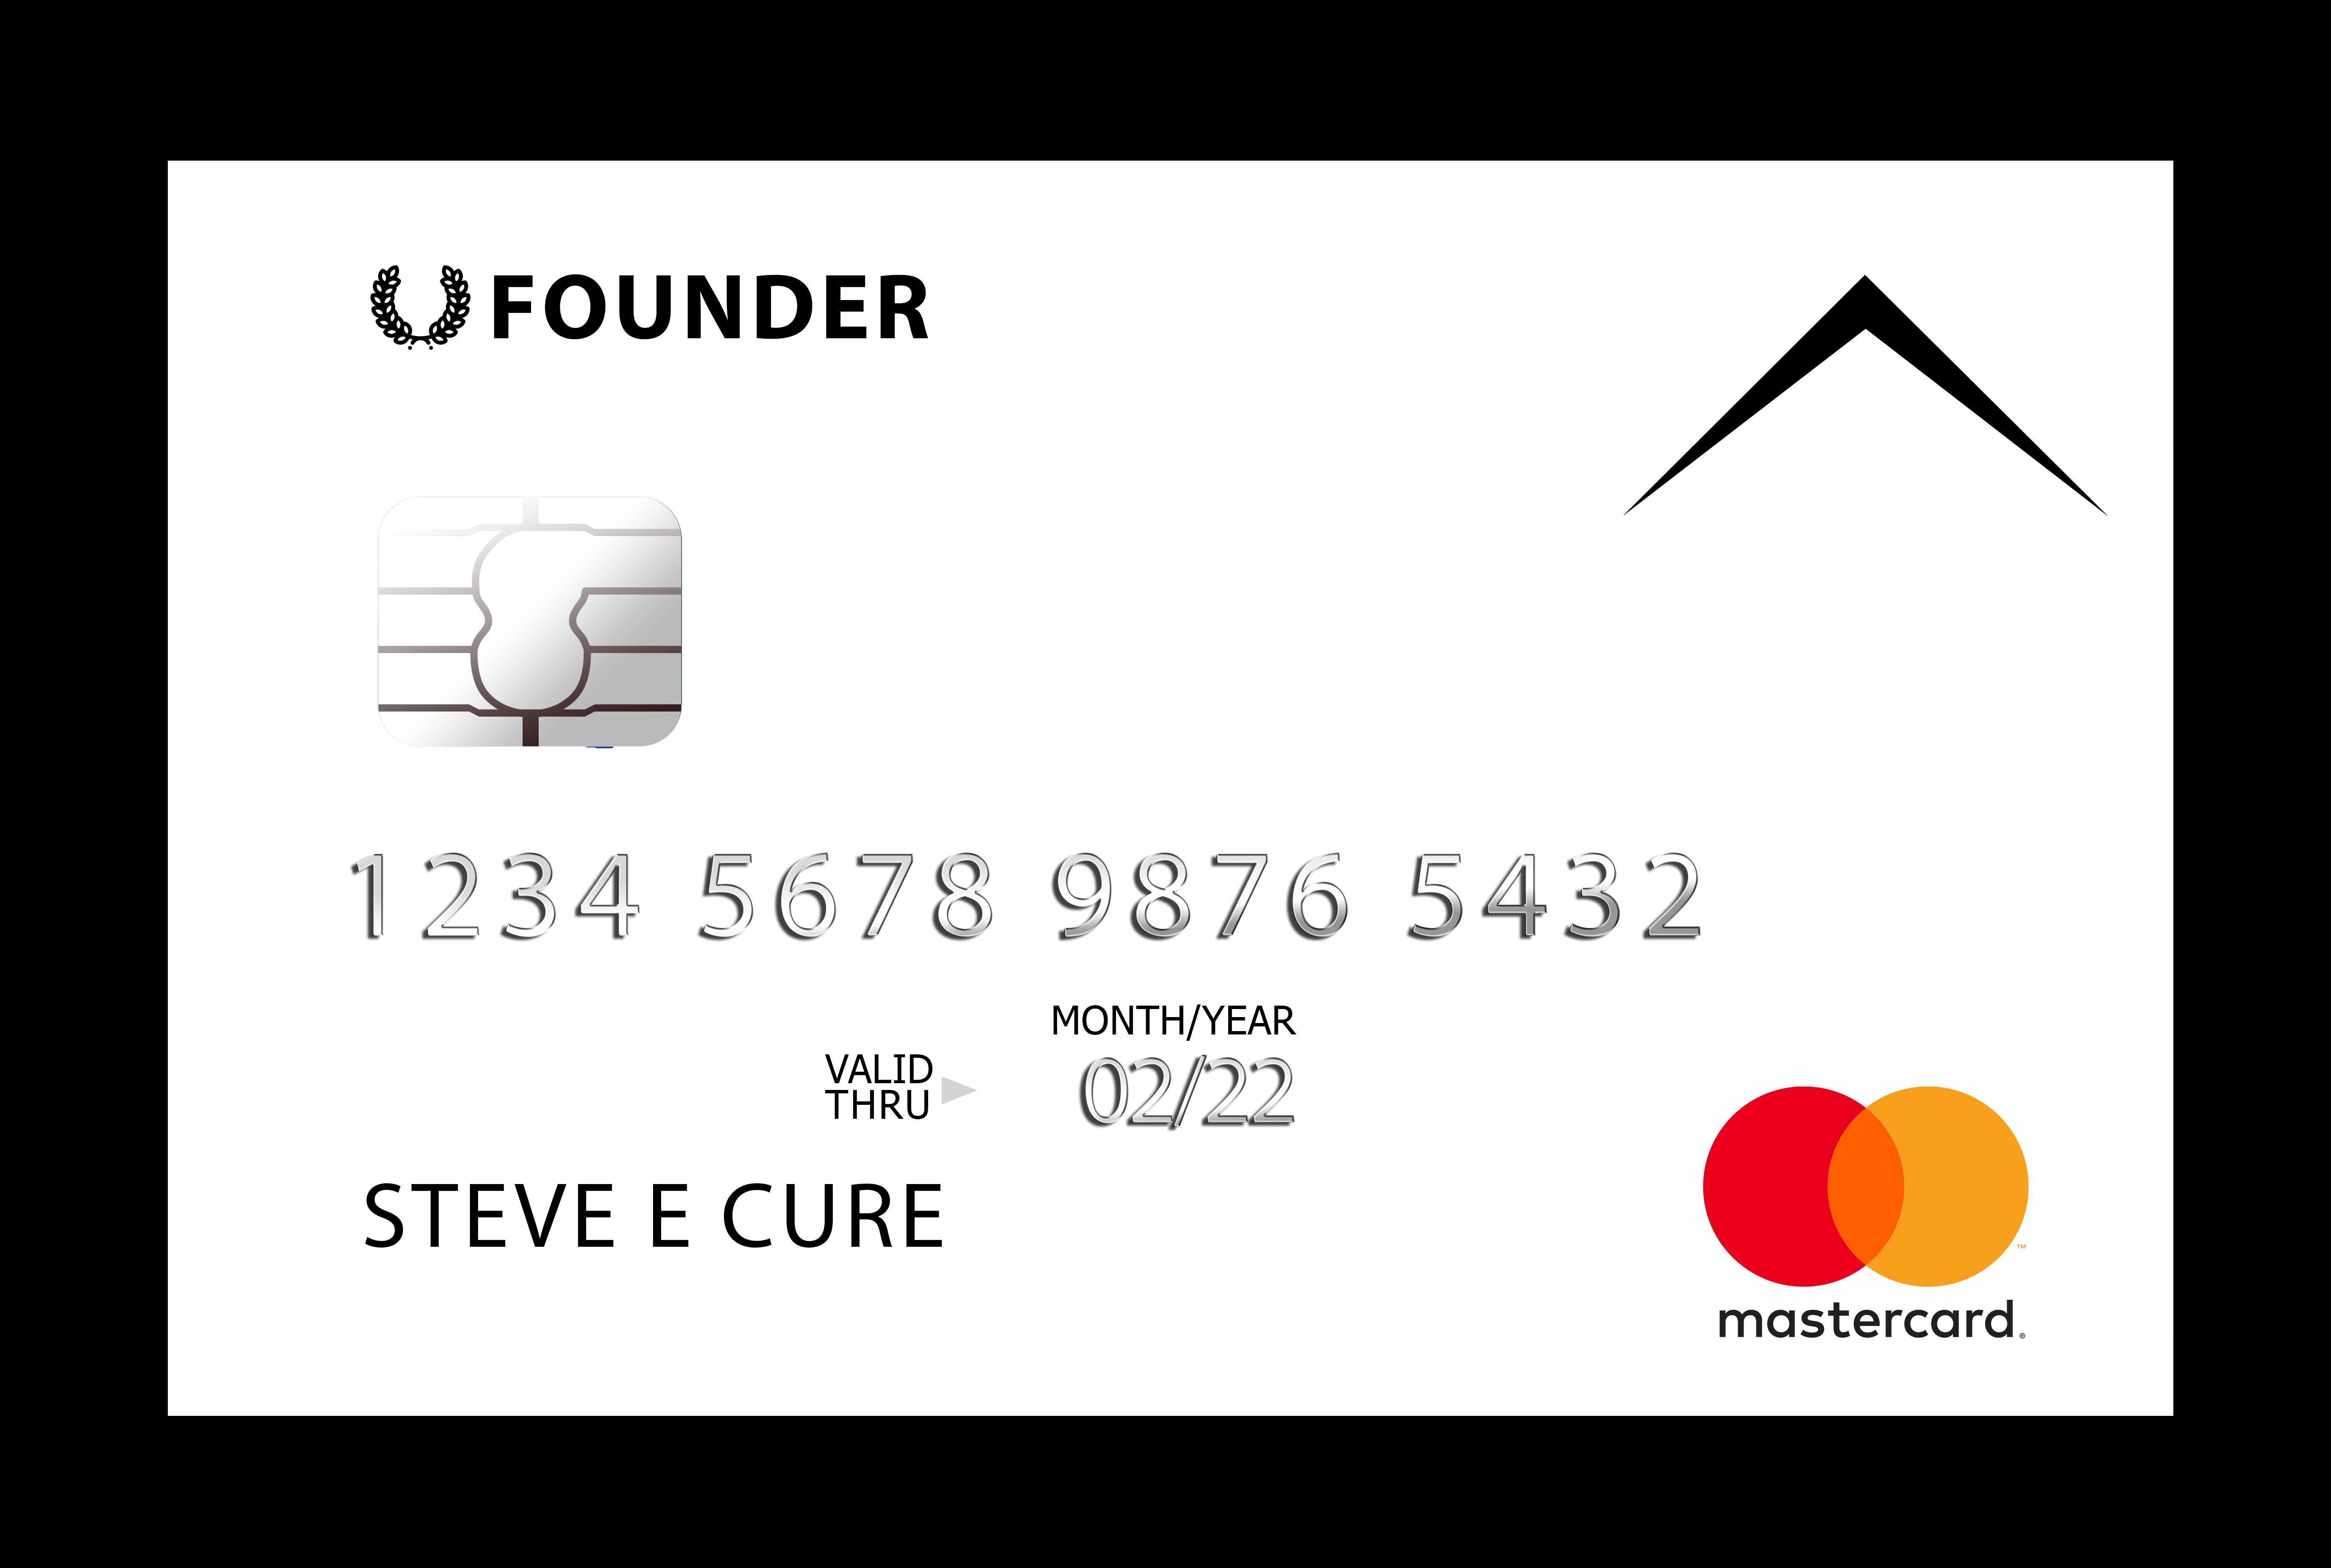 Standard + Founder Status